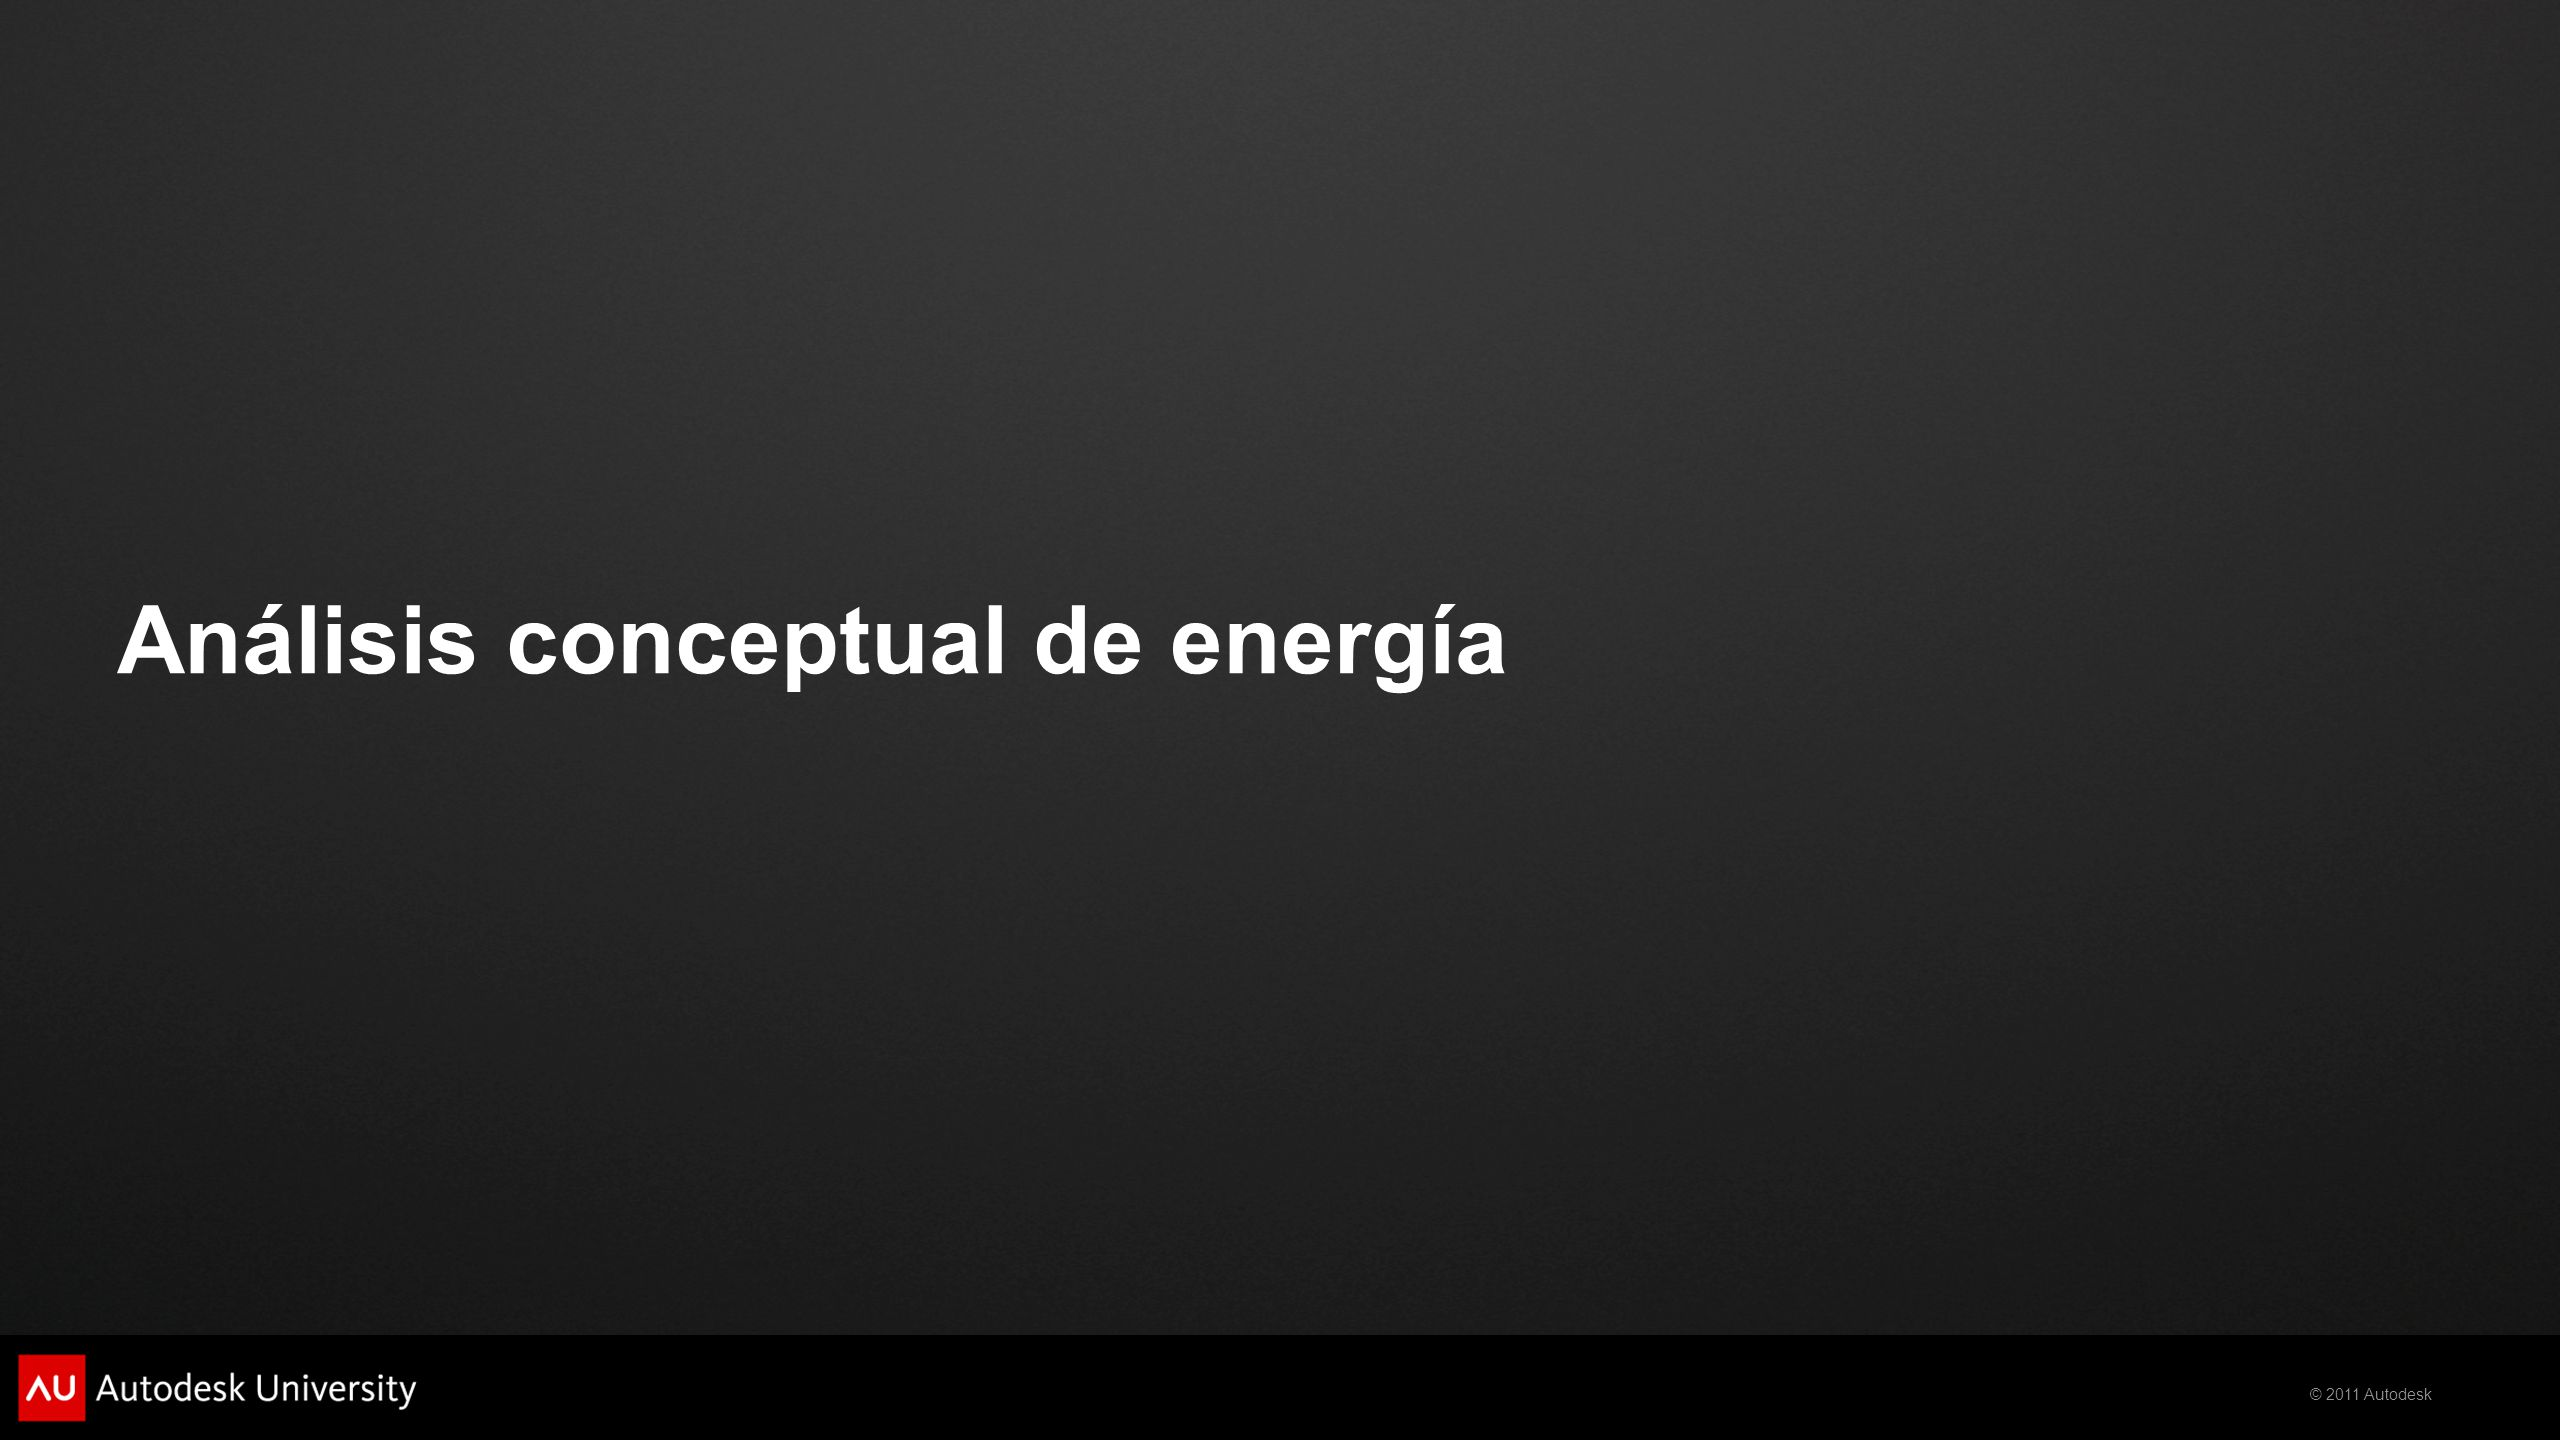 Análisis conceptual de energía